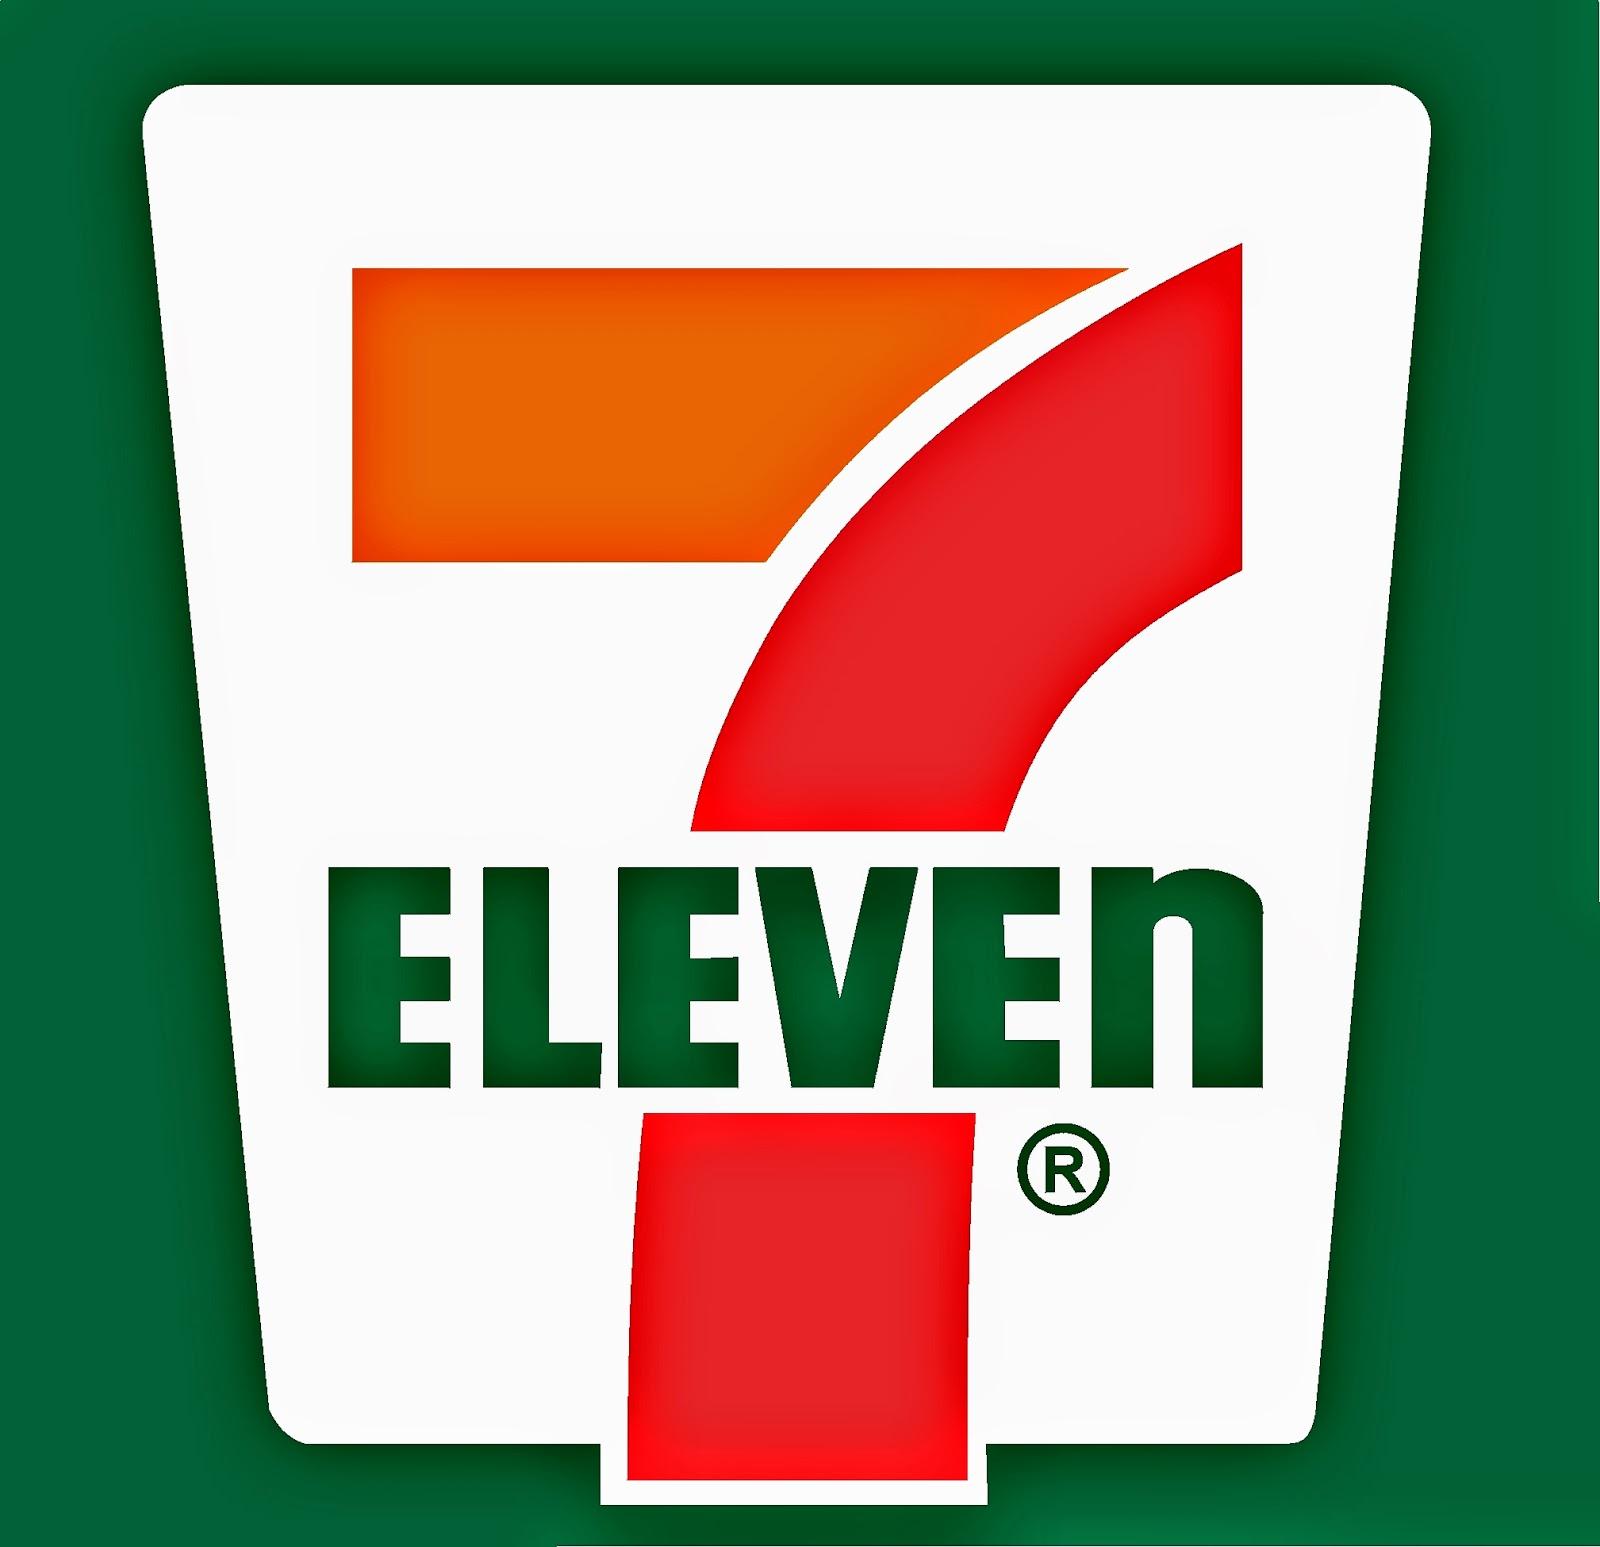 JOB OPENING 888: Job Opening 888: 7-Eleven Davao